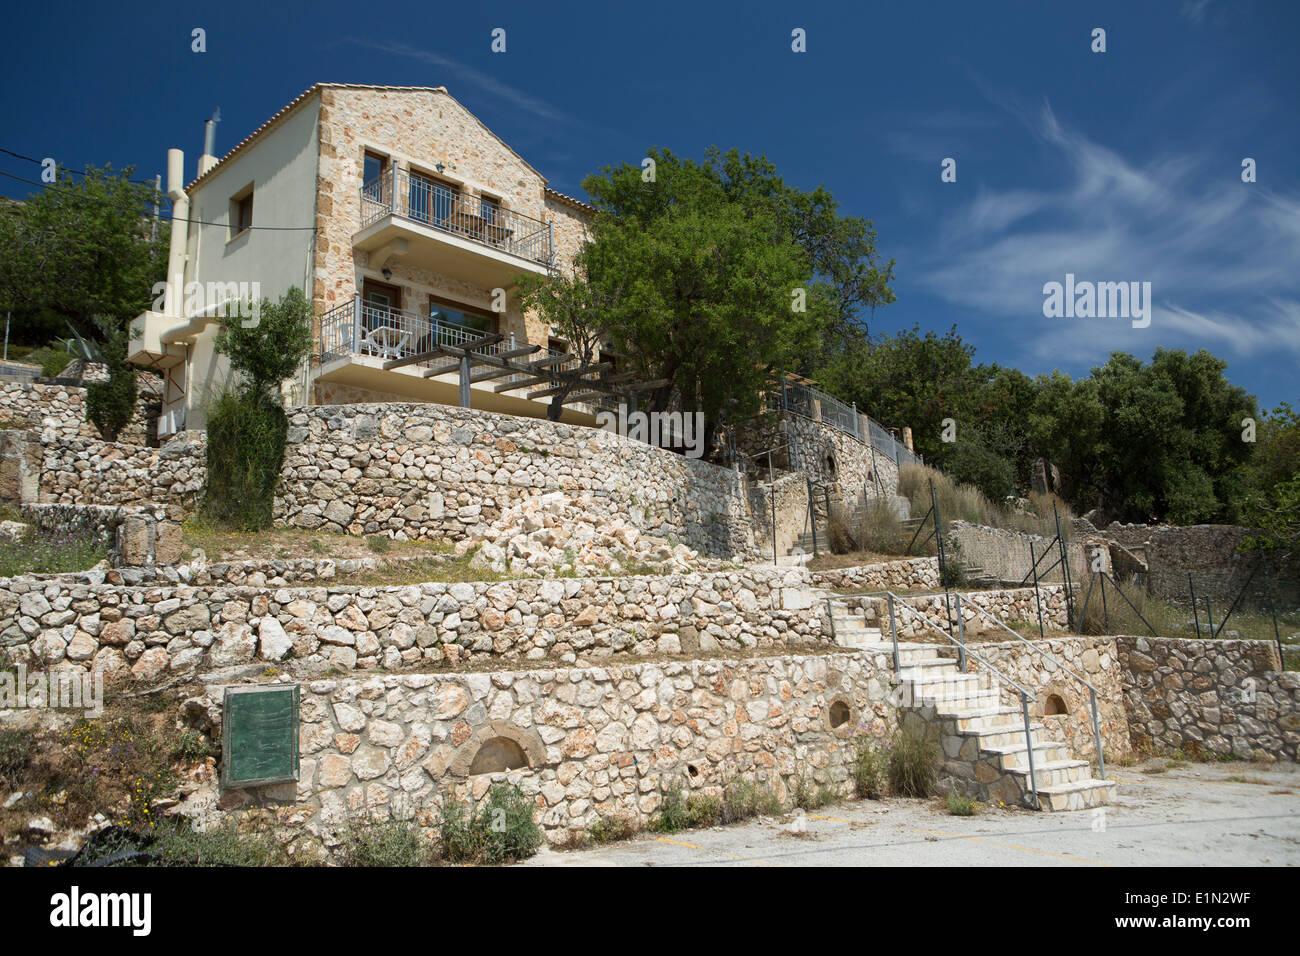 Looking up at Kelari Taverna, Kefalonia, Greece Stock Photo